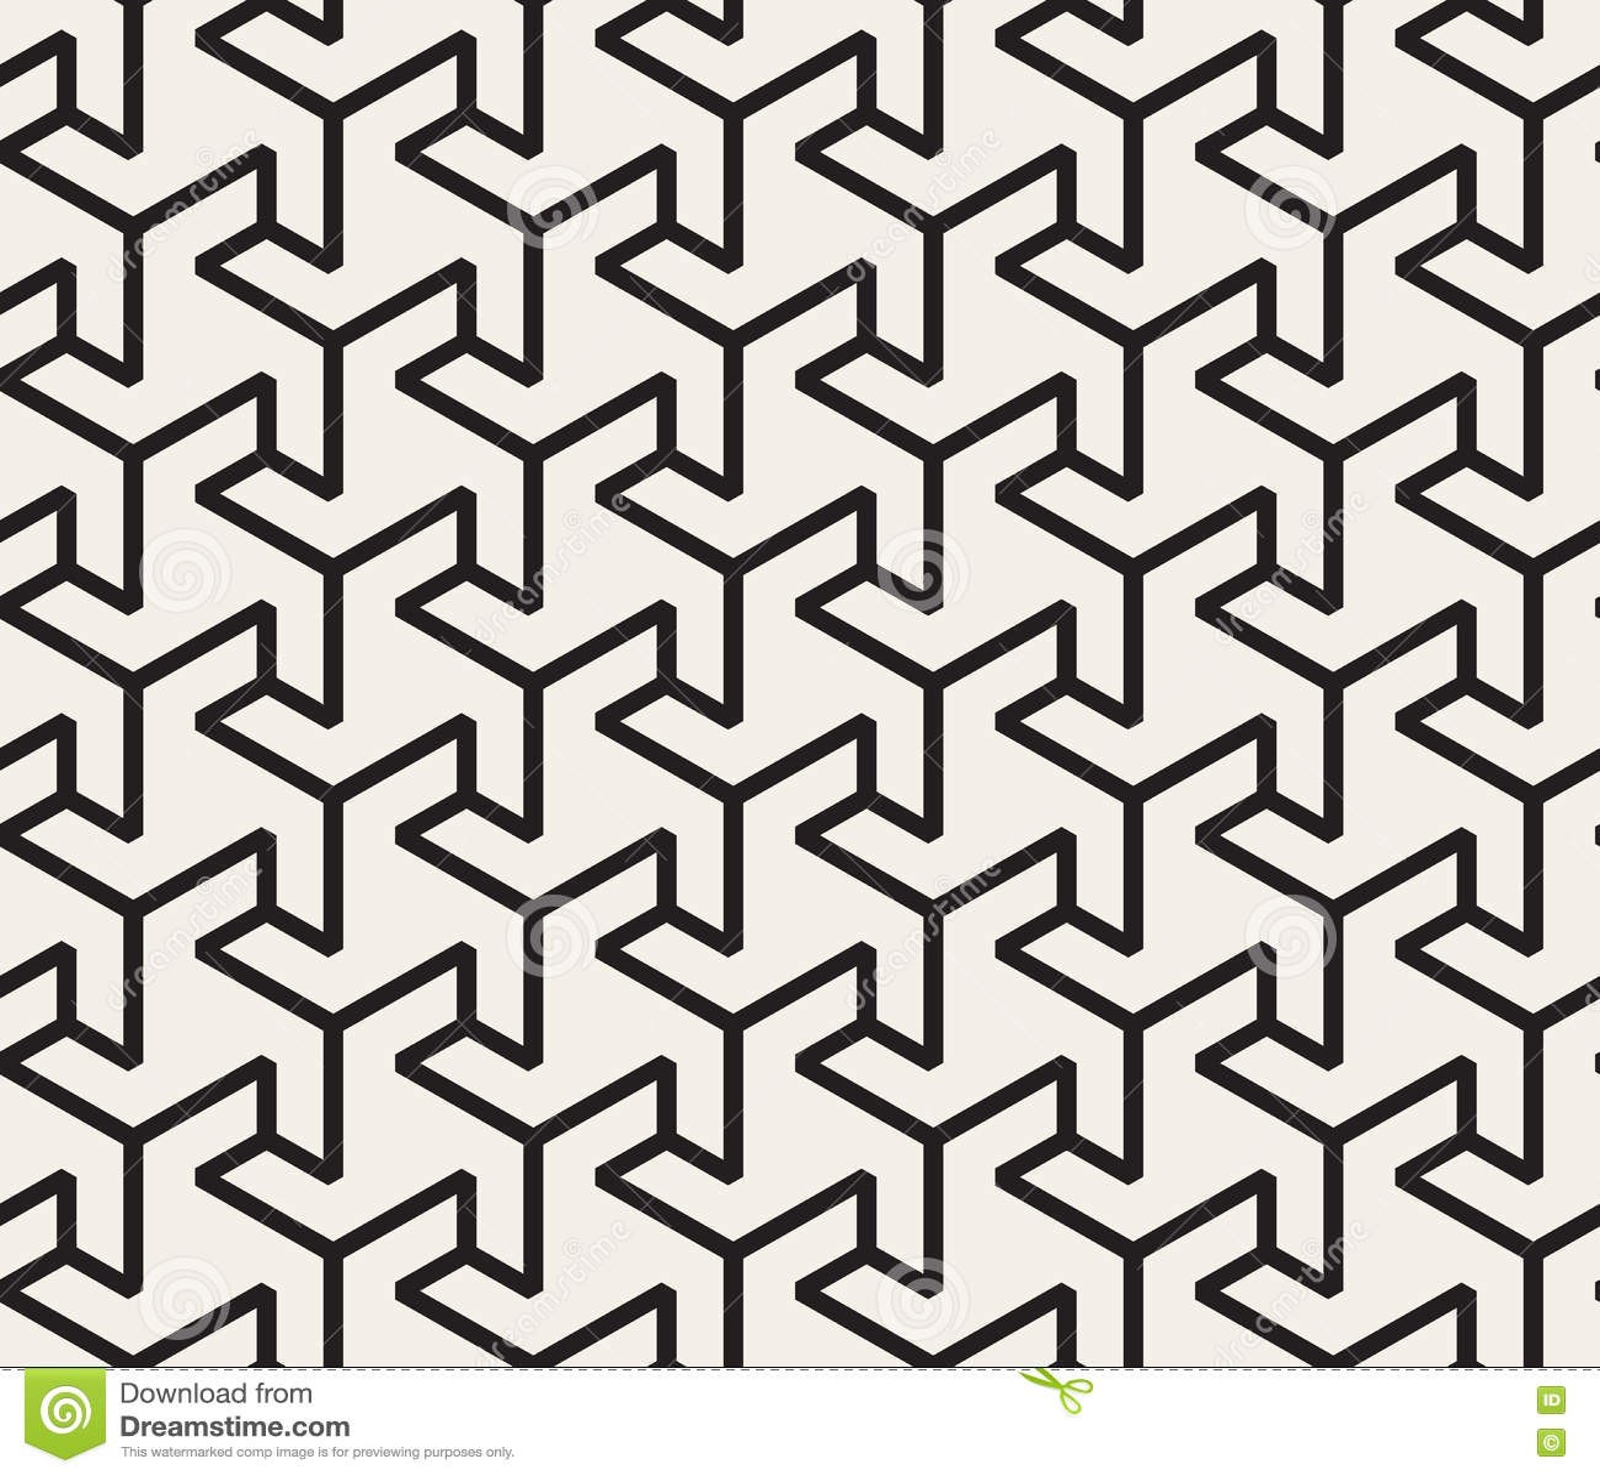 Vector Seamless Black And White Geometric Triangle Shape